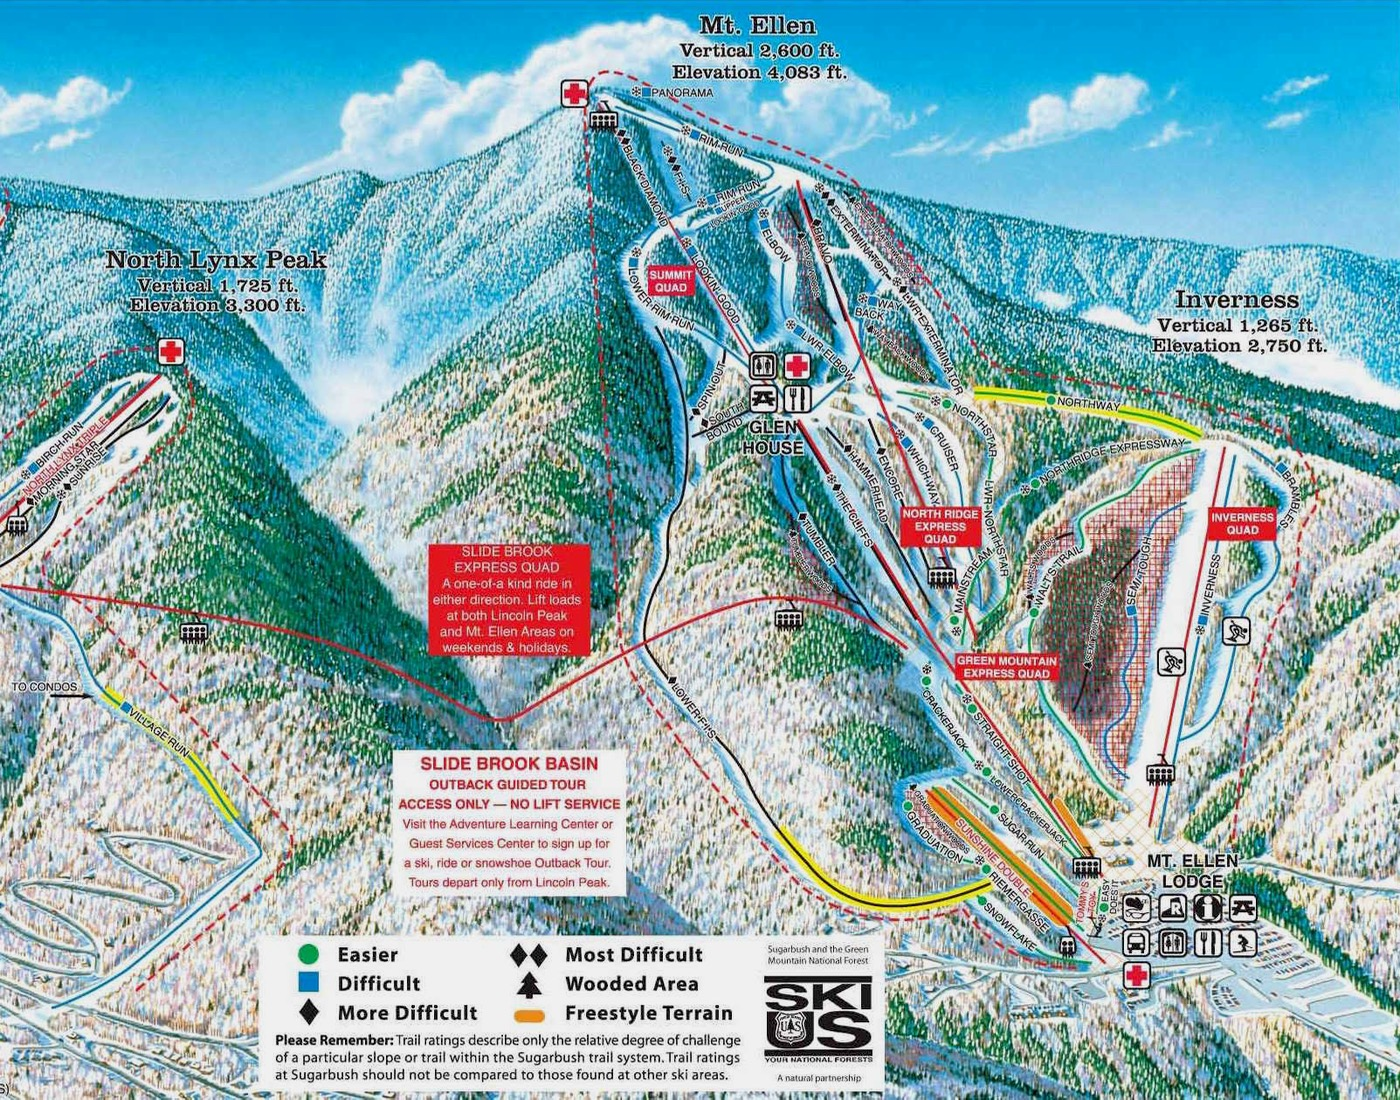 Sugarbush Resort trail map Mount Ellen